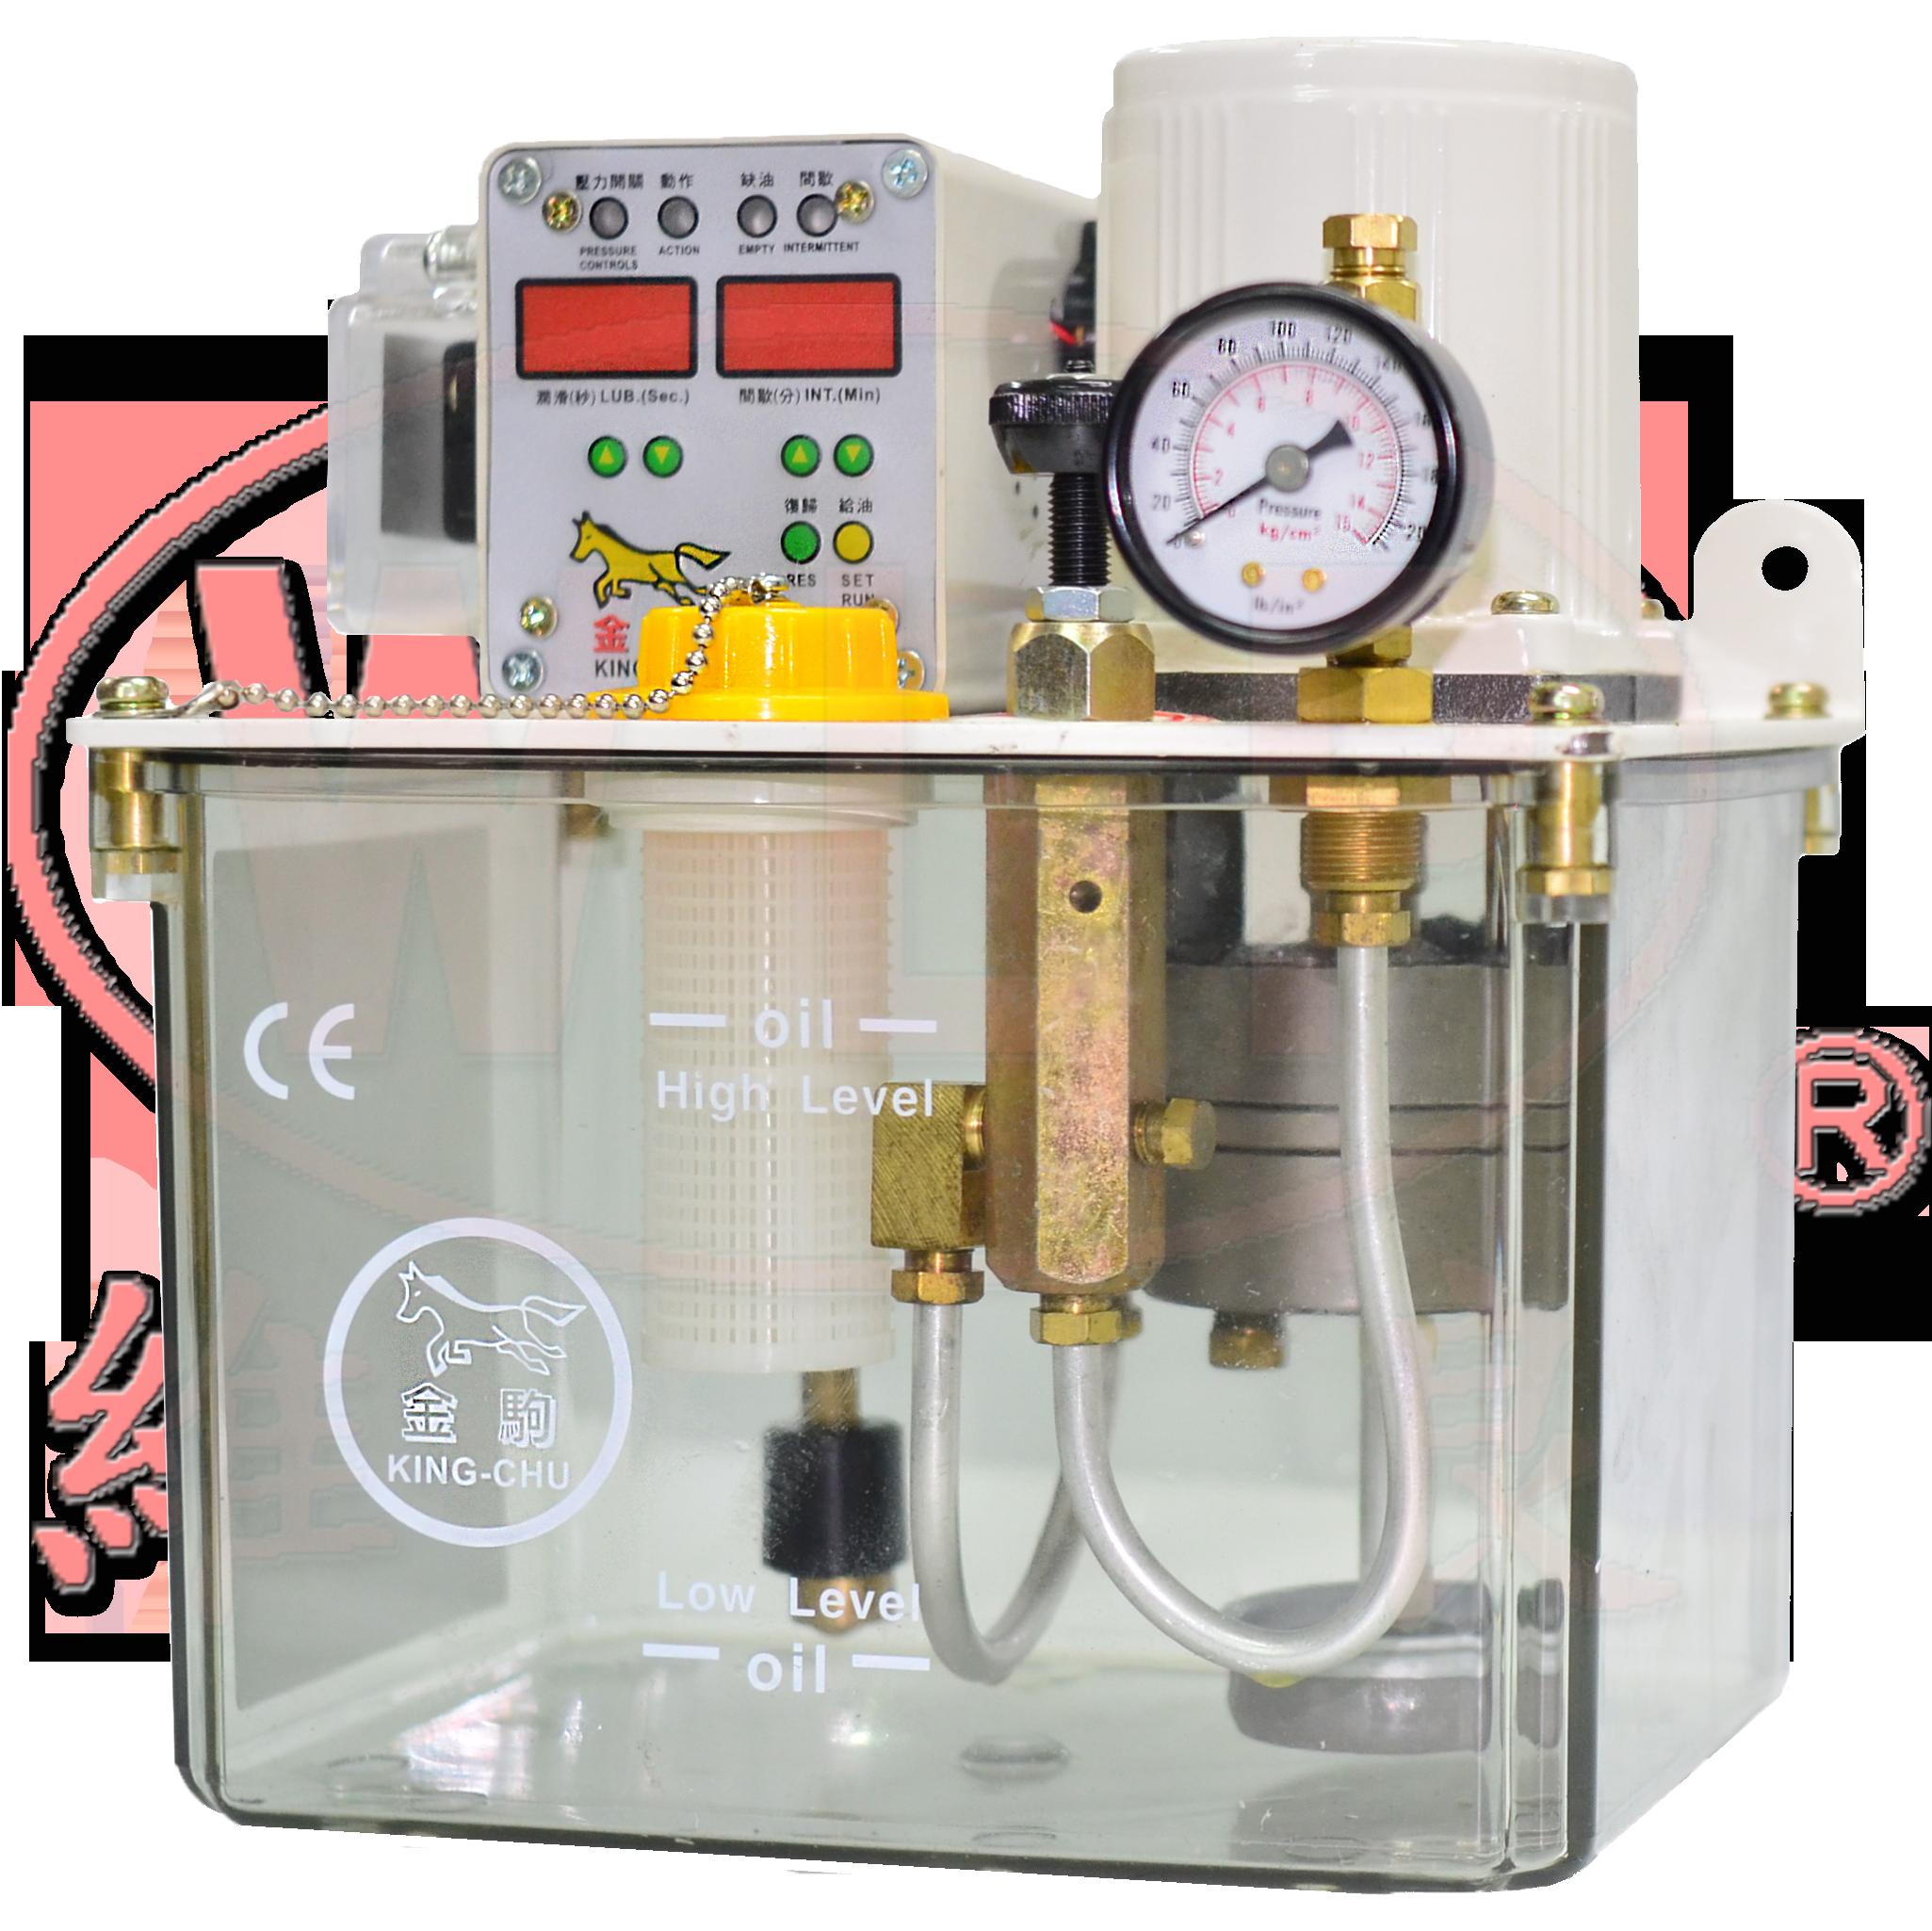 MIC-280A 電動微電腦調整間歇注油機